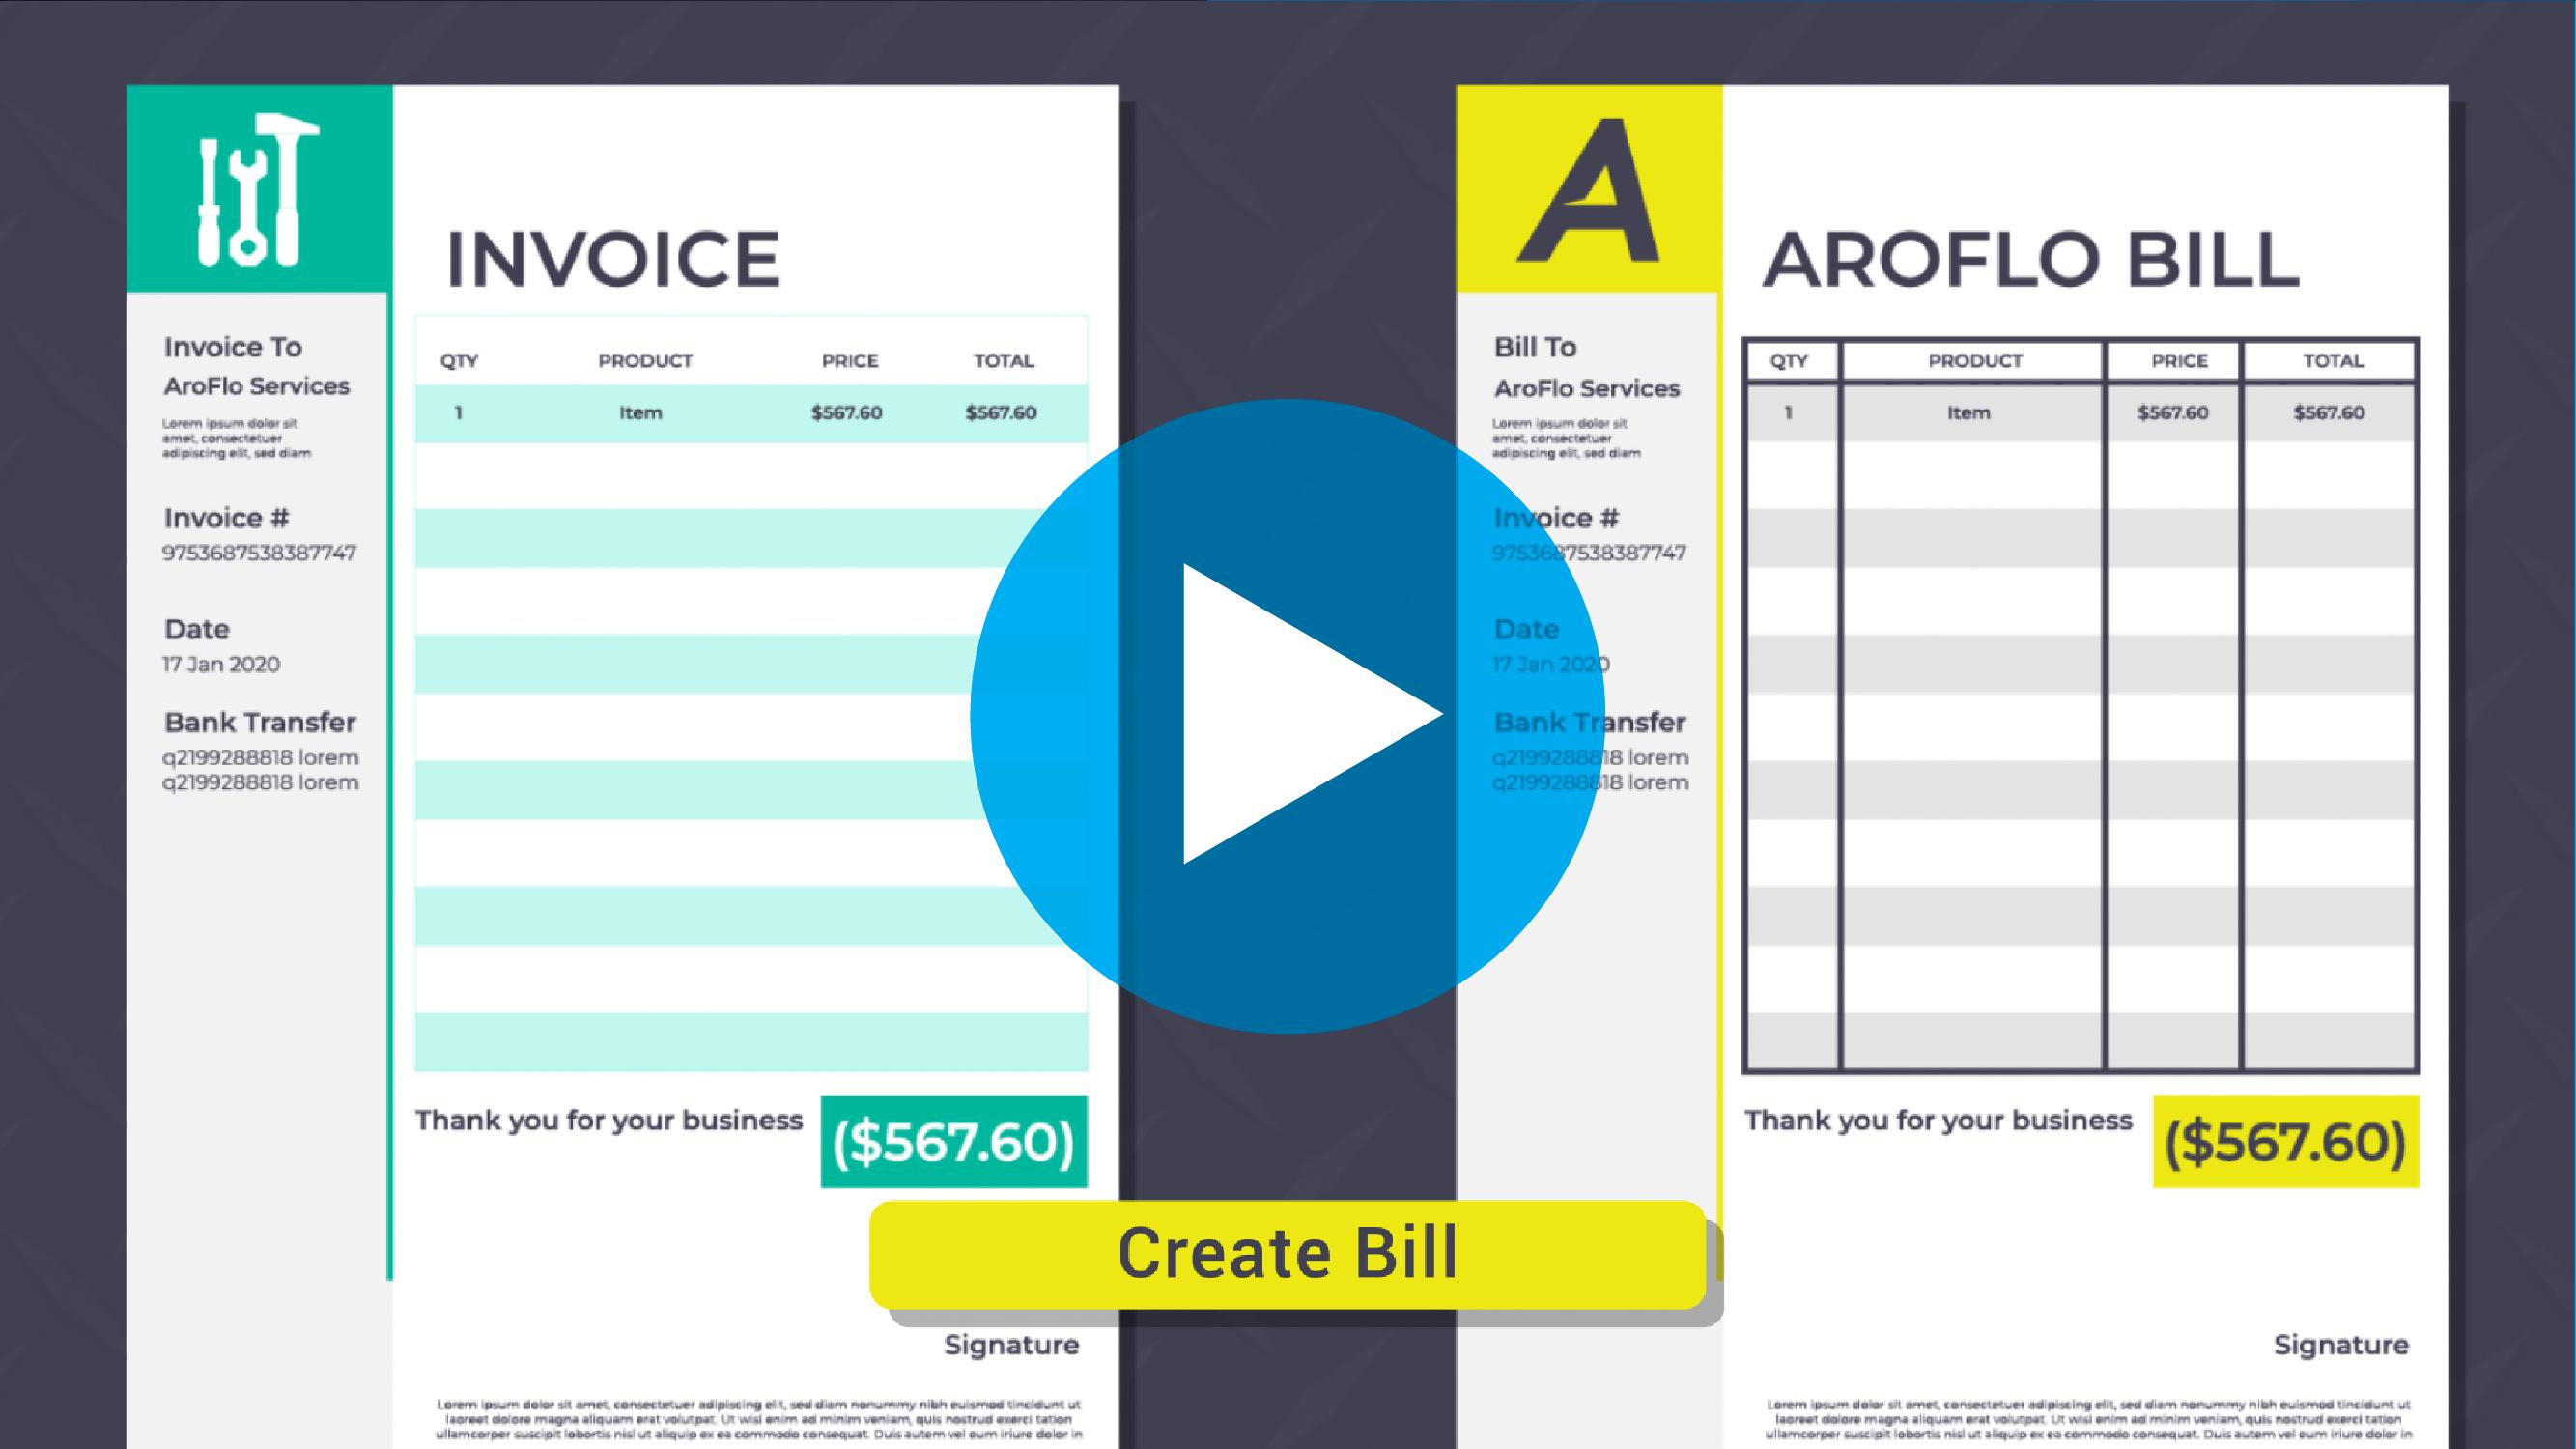 Purchase Order vs Bill